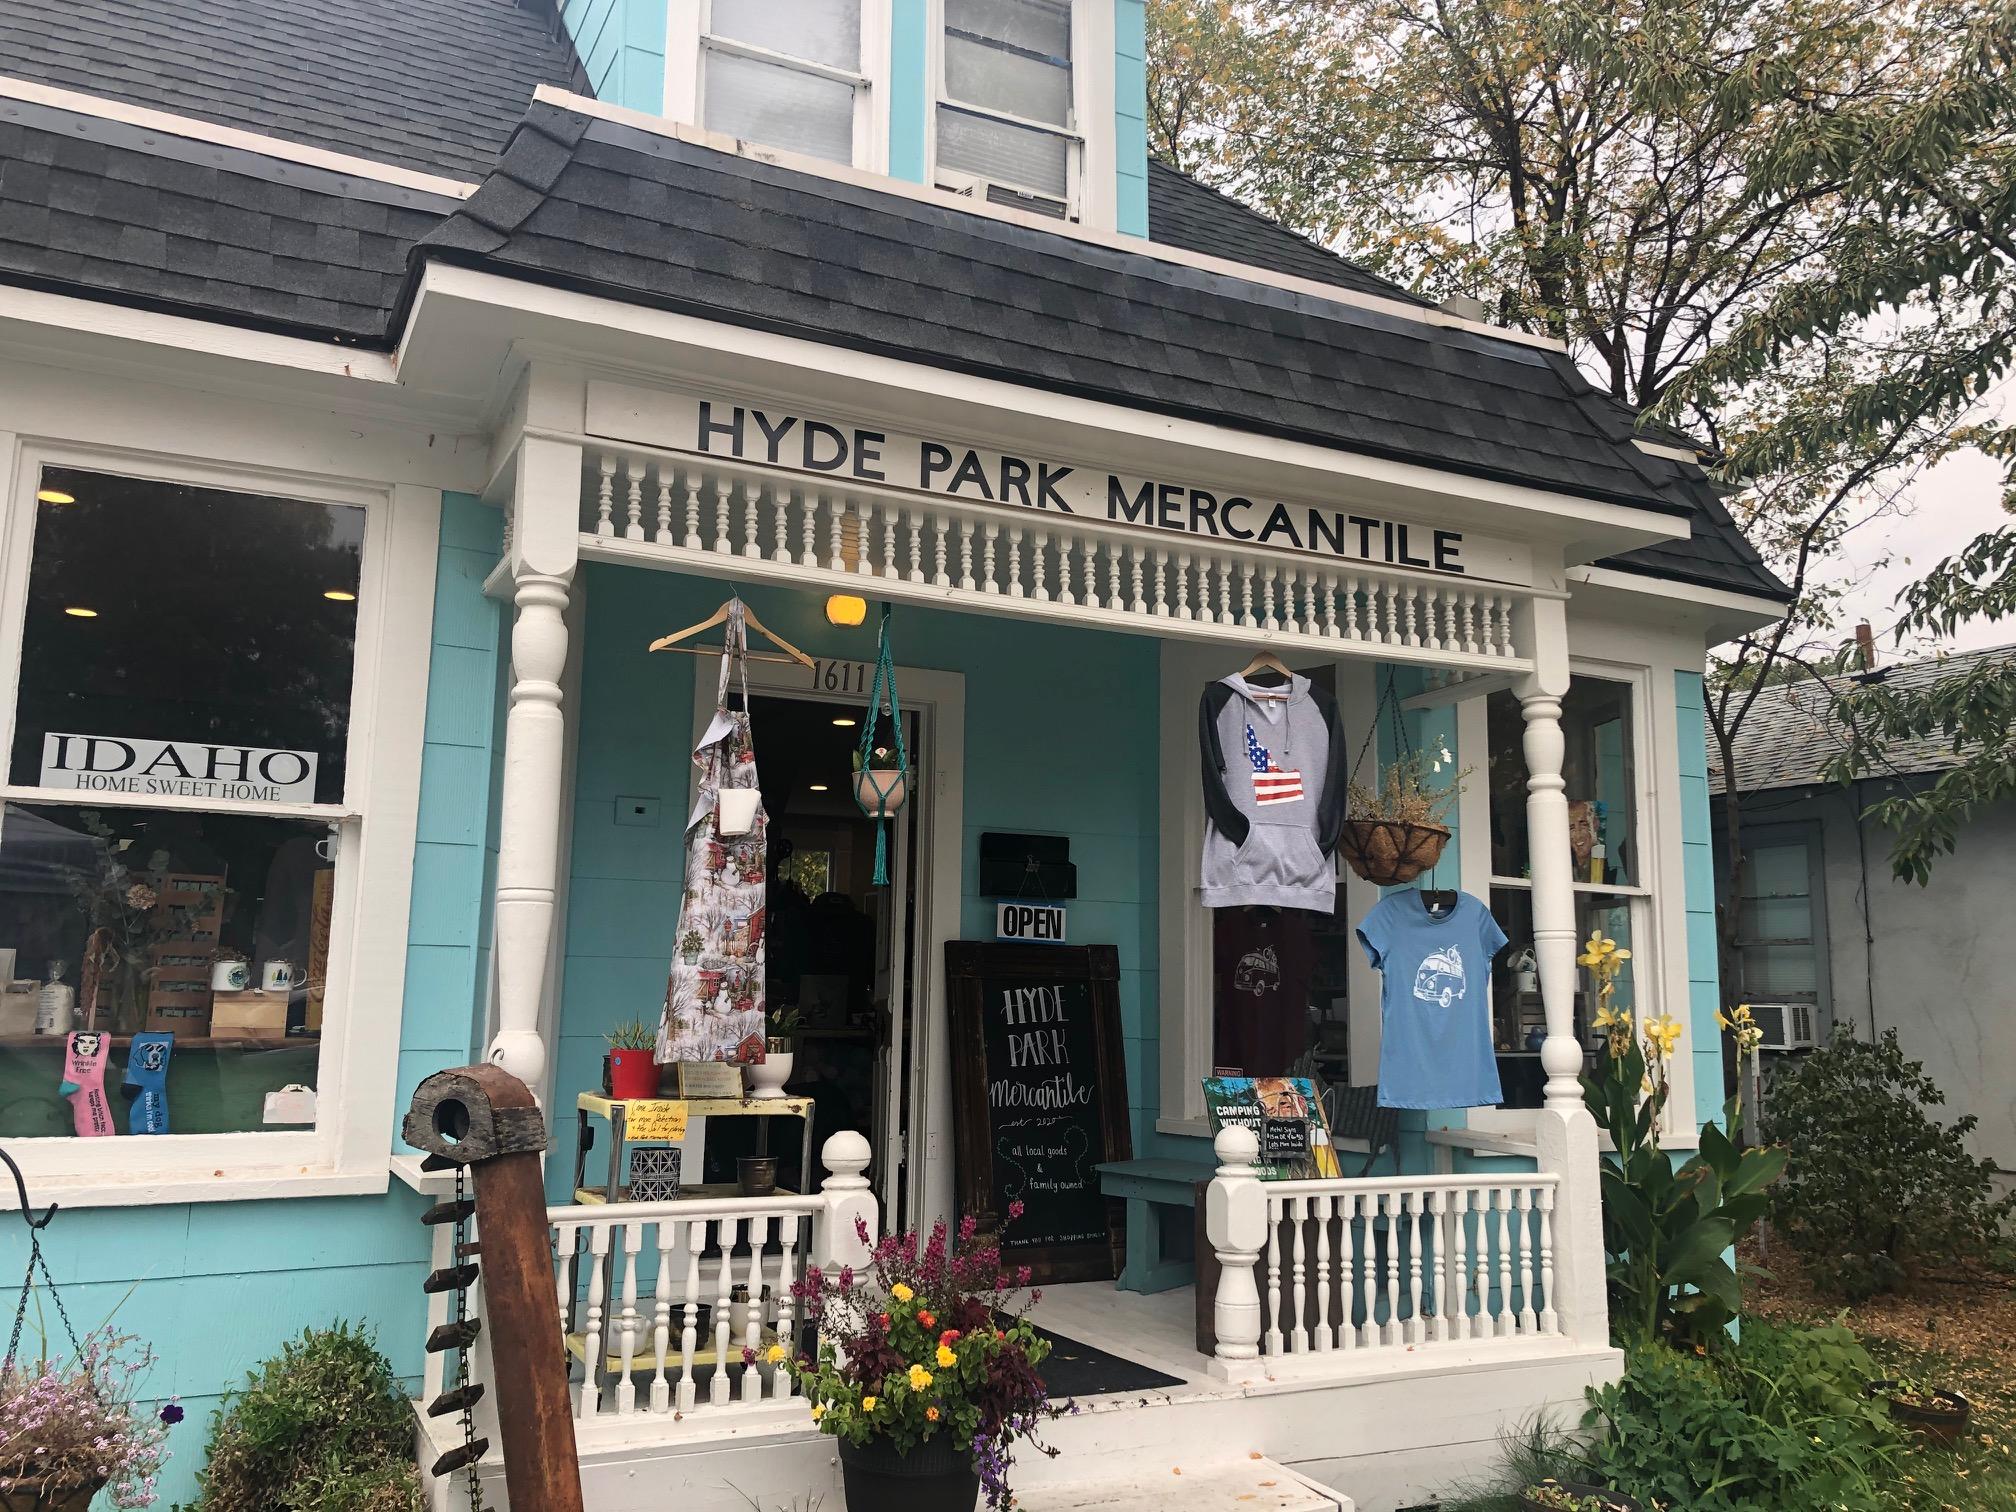 Hyde Park Mercantile